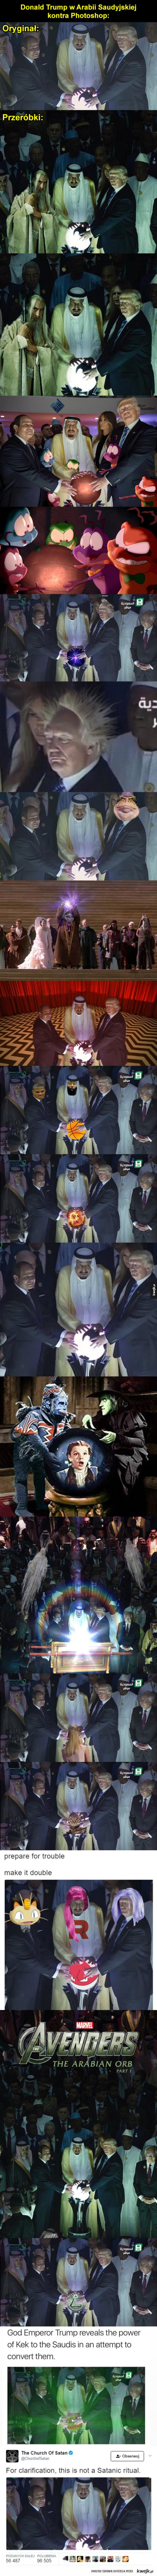 Donald Trump, kula i Photoshop